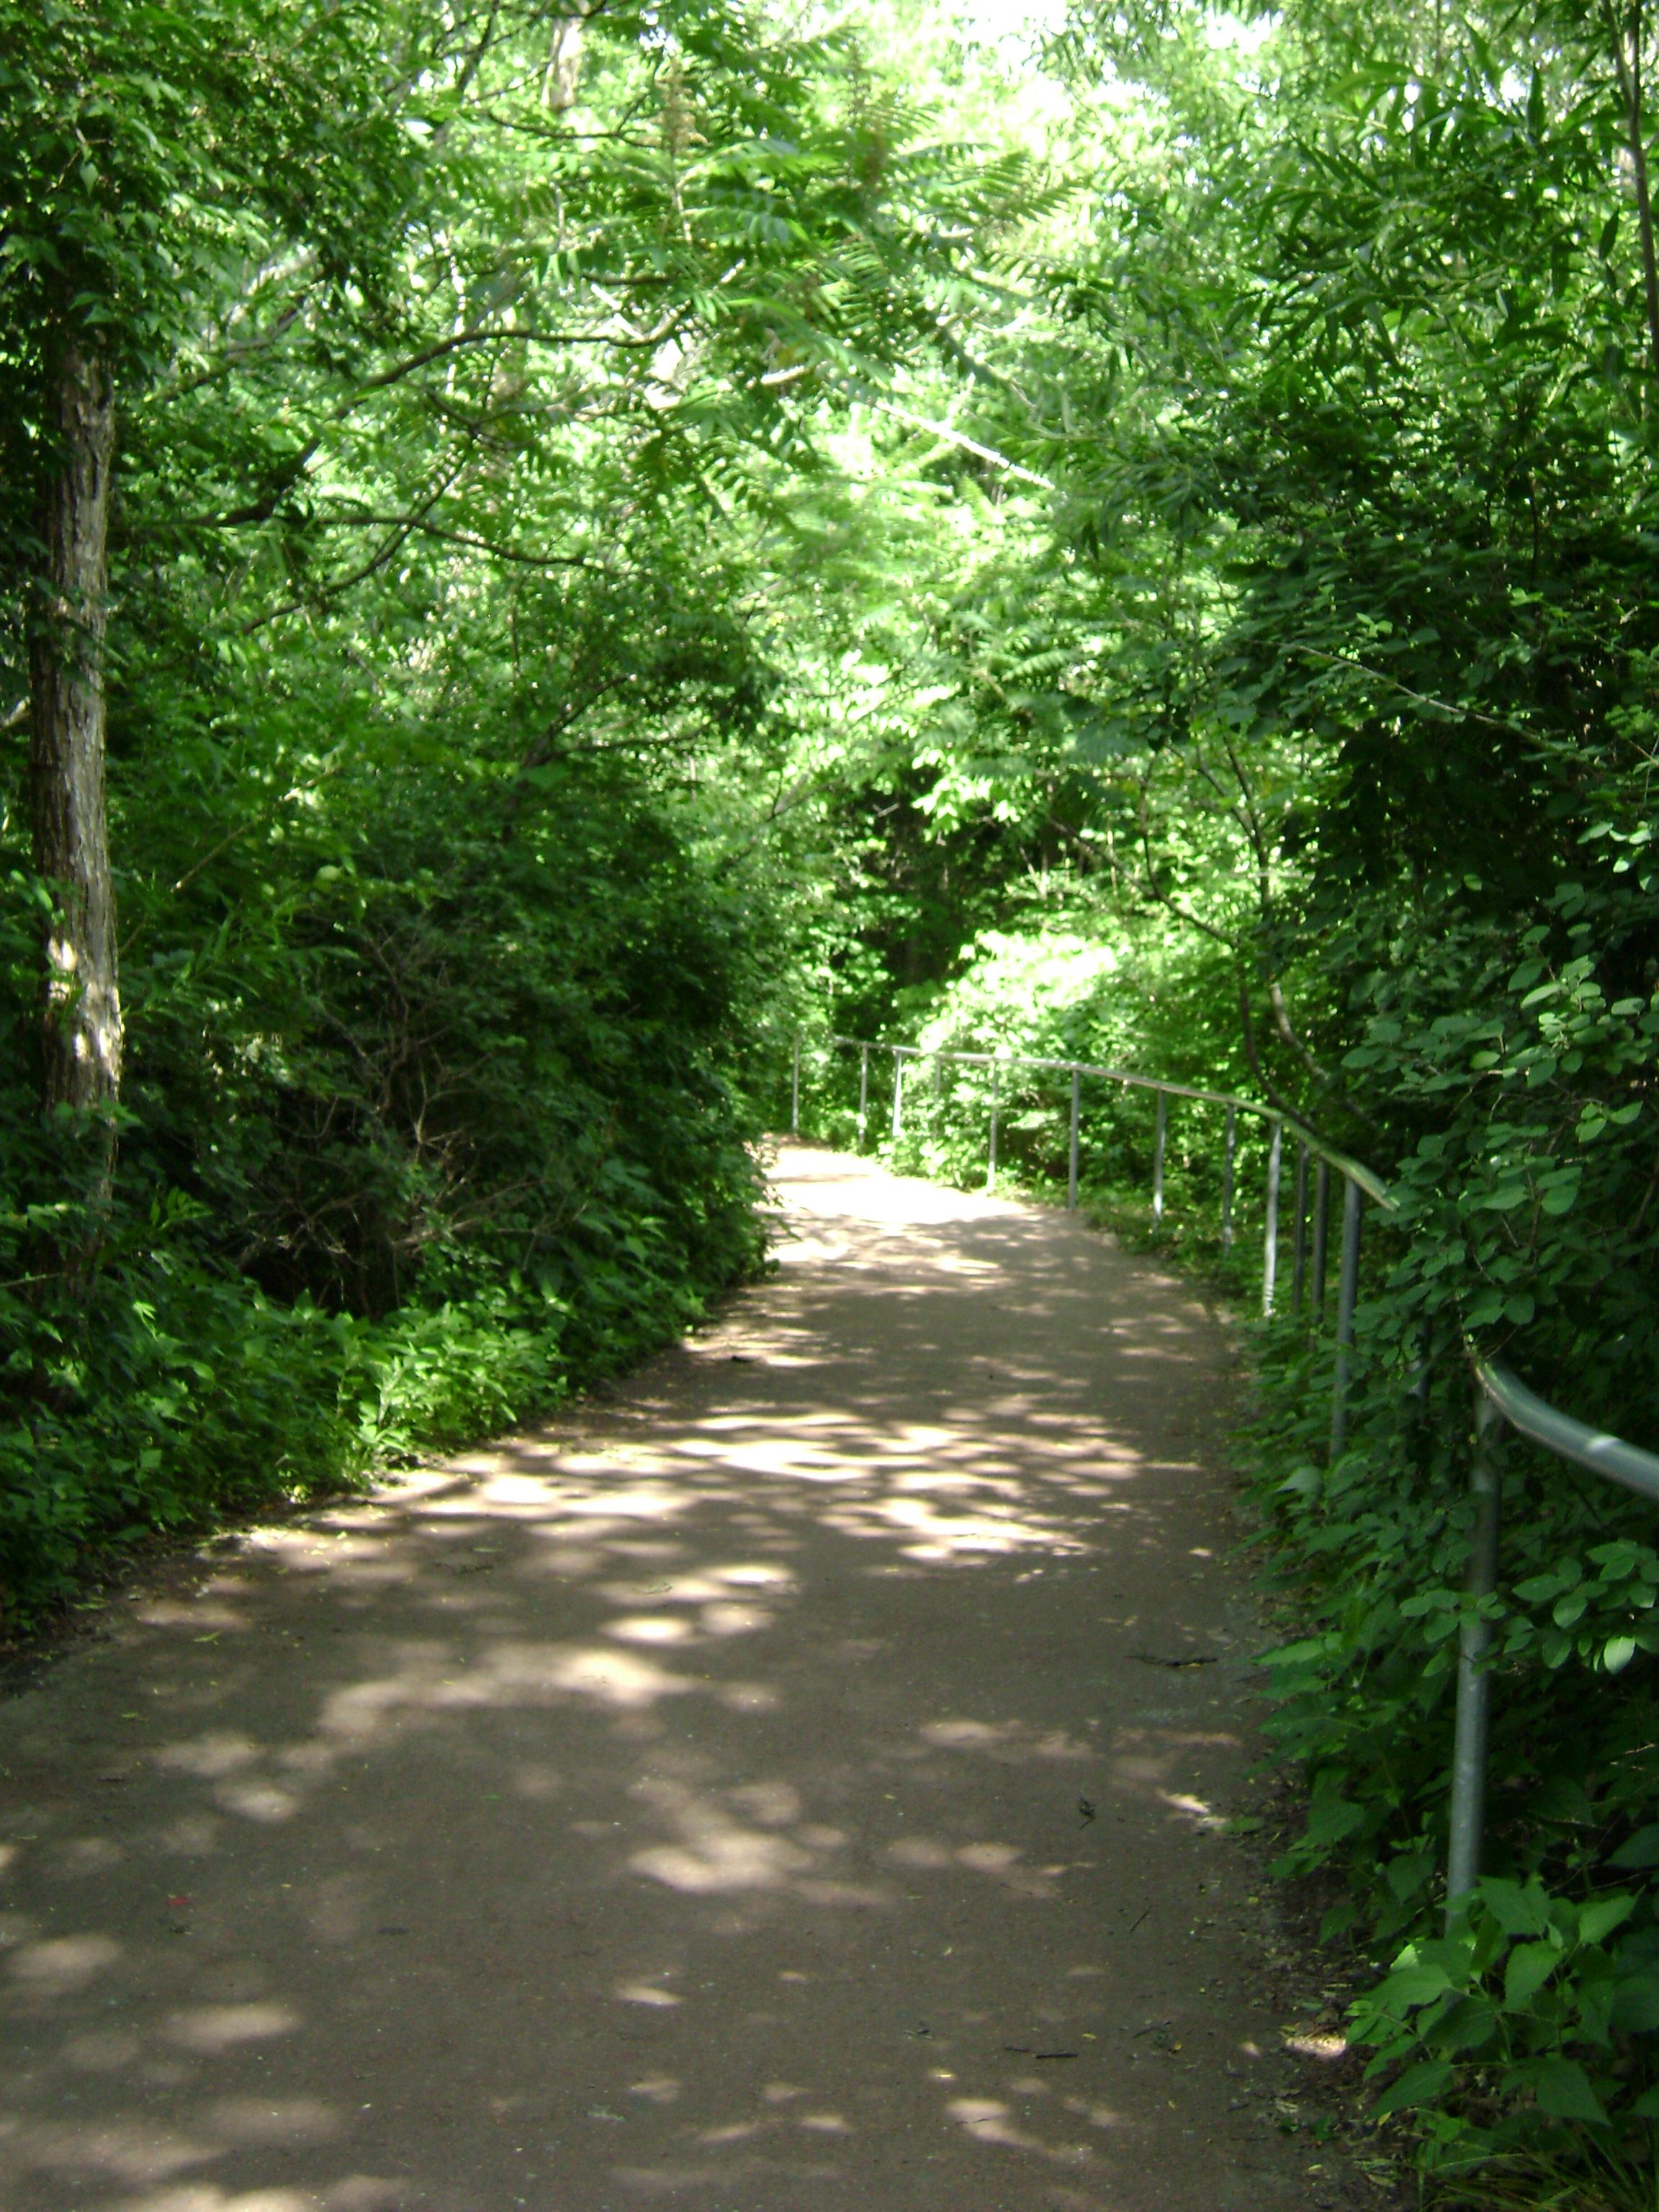 Path through the woods, Nature, Parks, Paths, Plants, HQ Photo